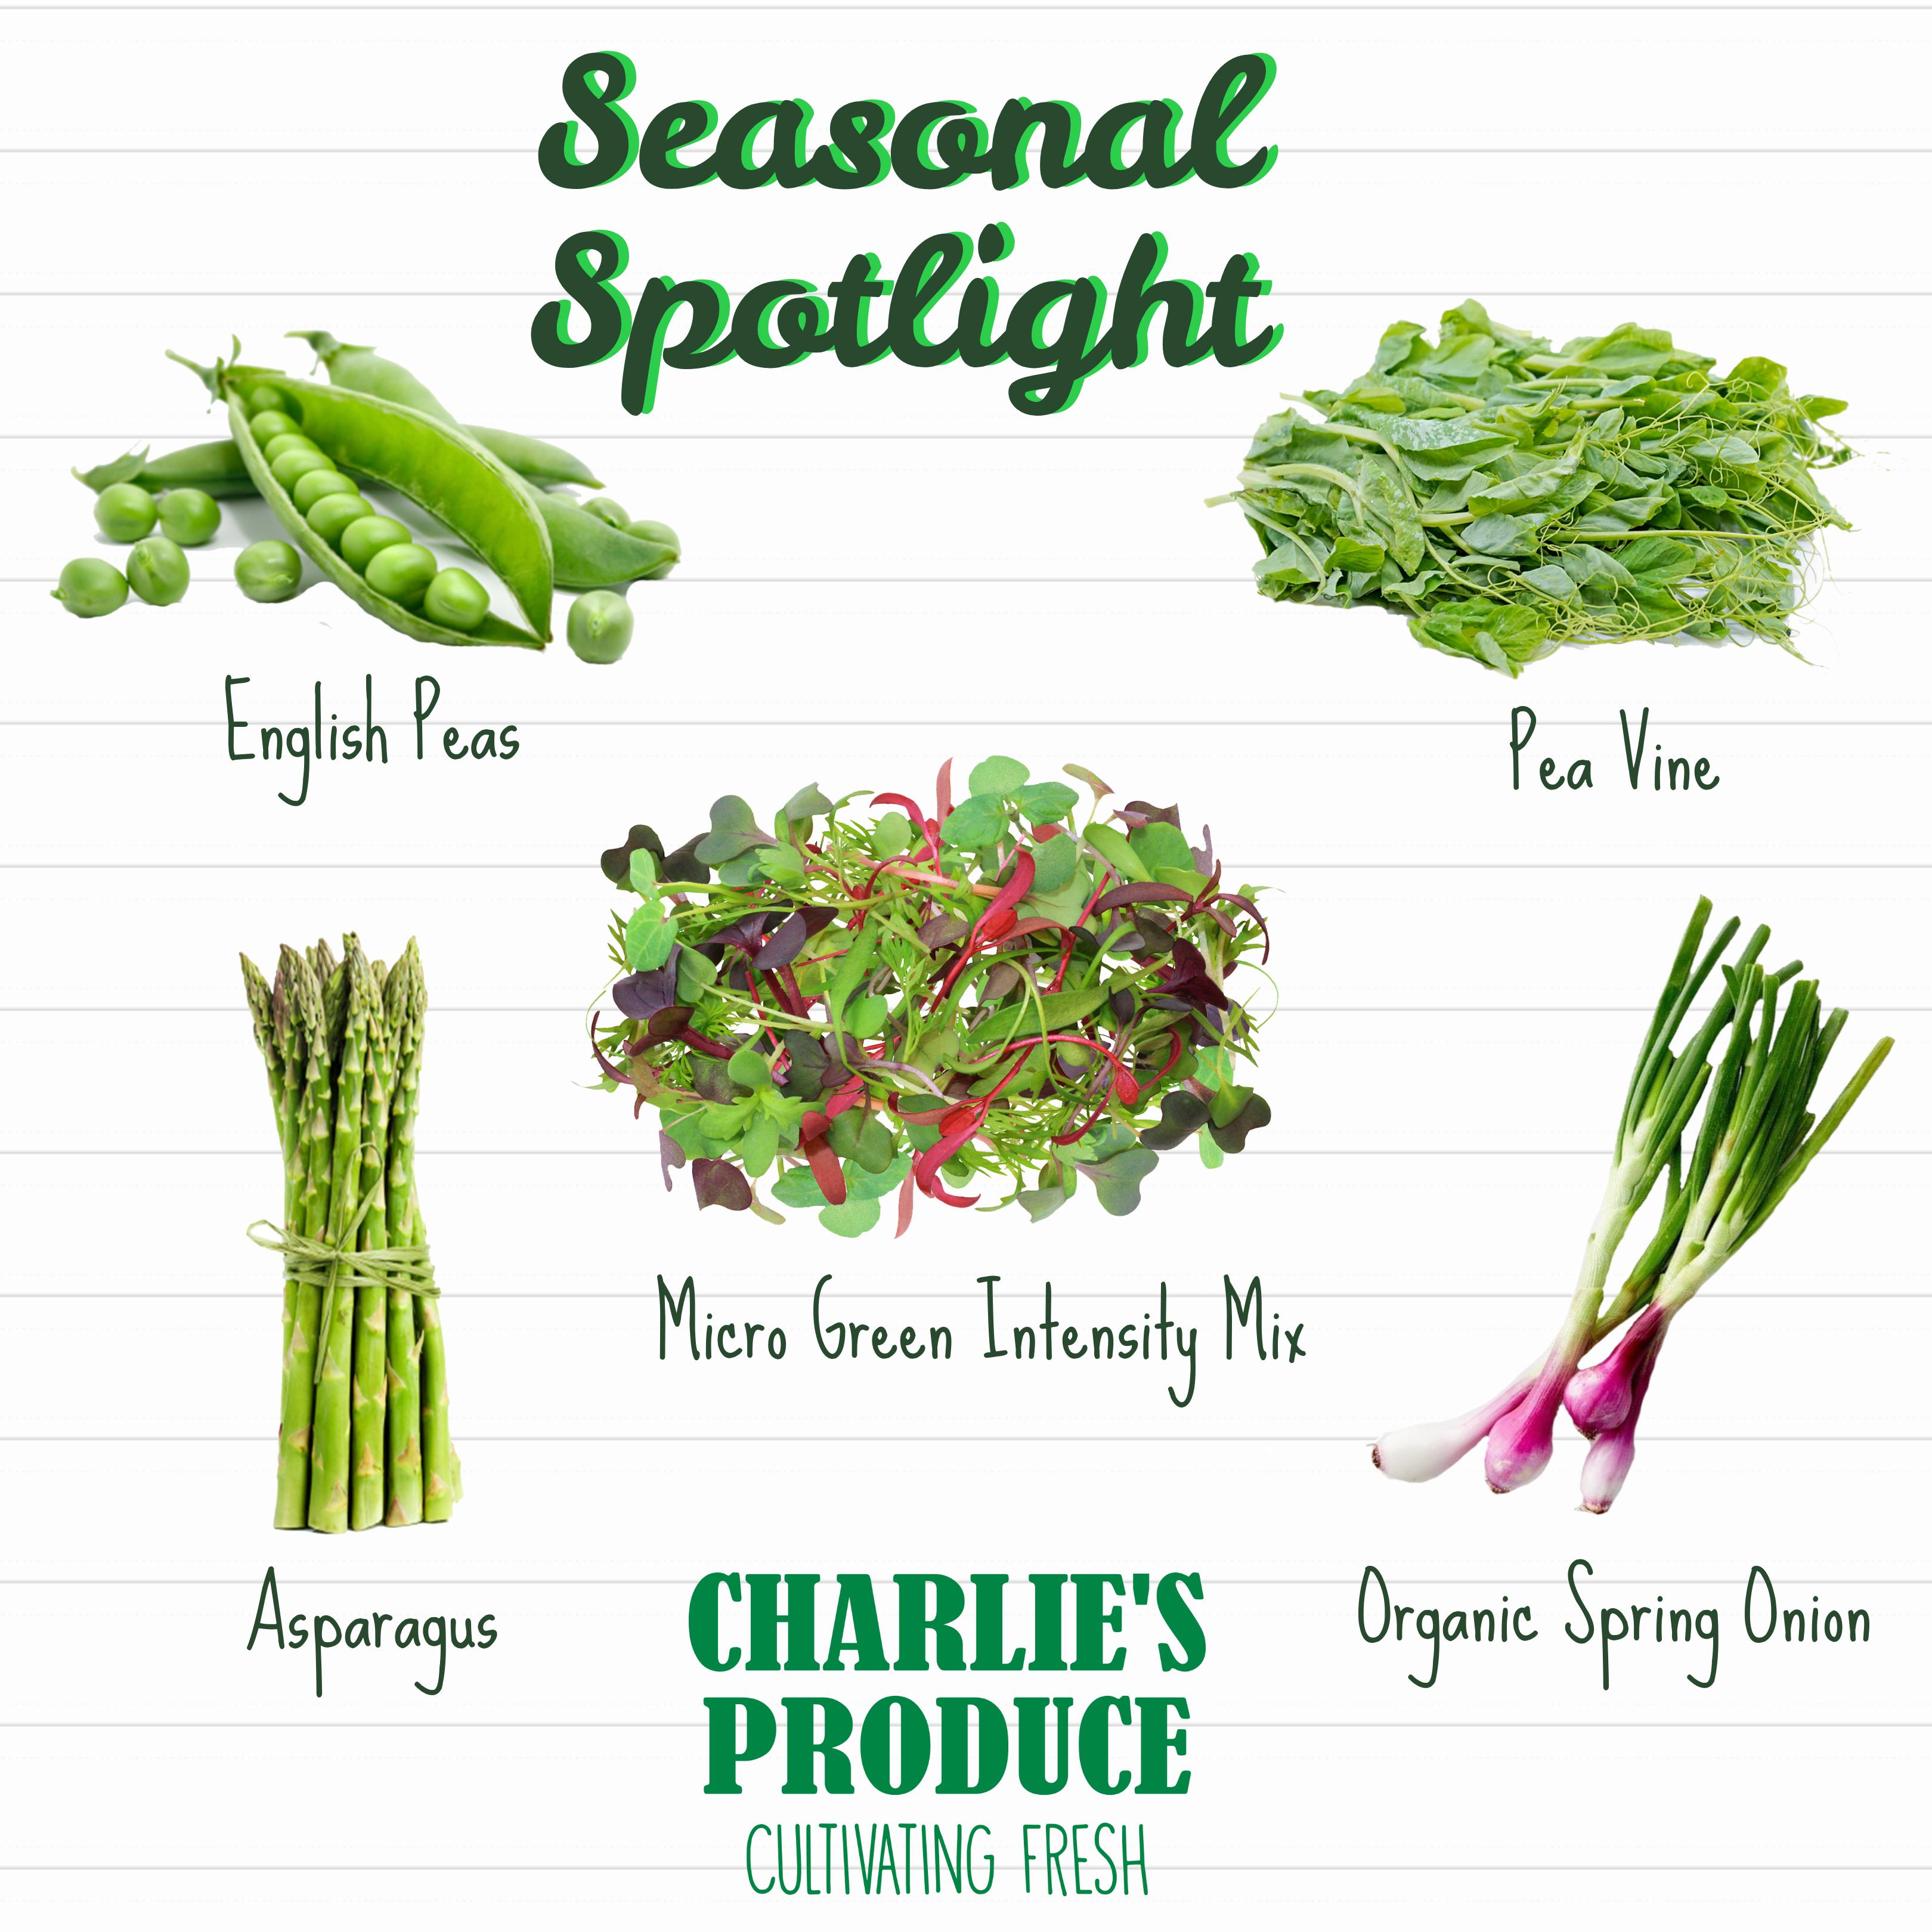 Seasonal Spotlight